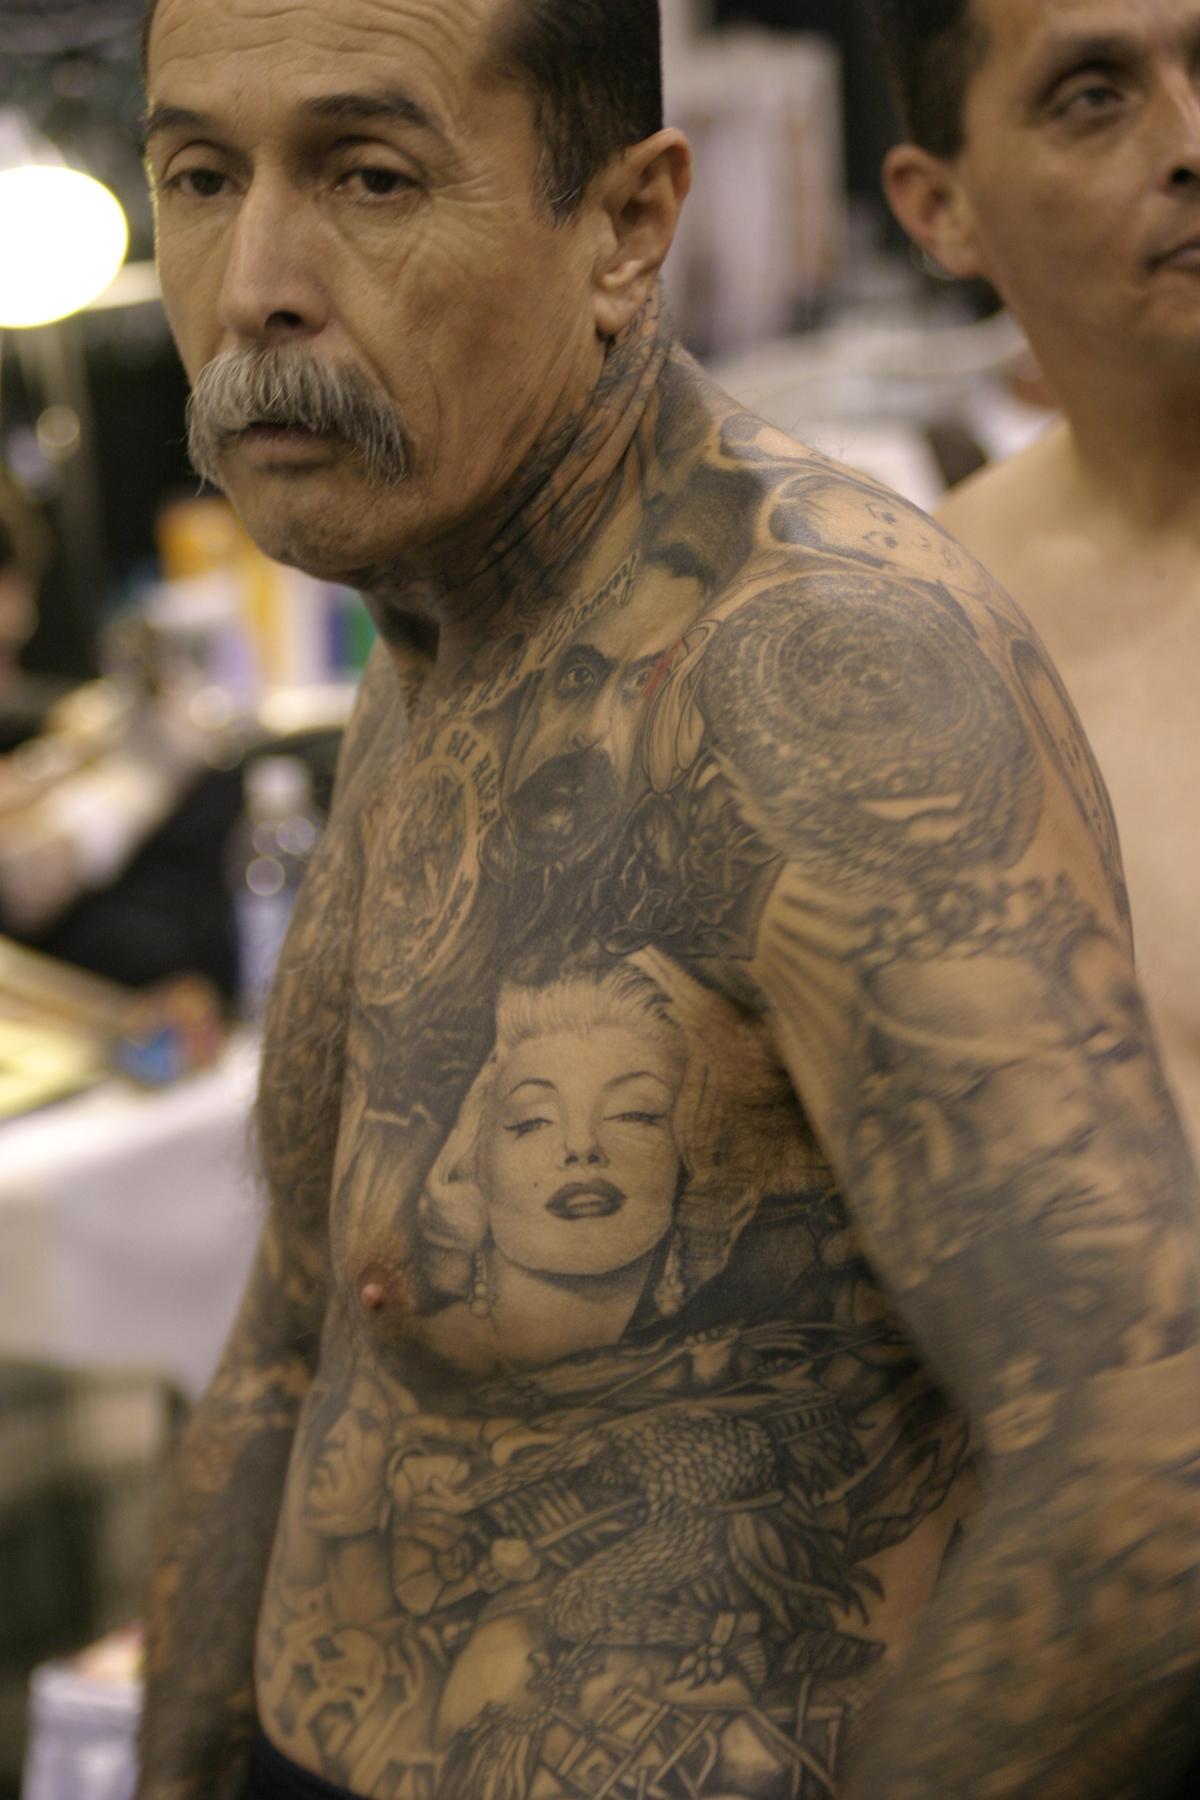 Tattoo_Expo039.JPG